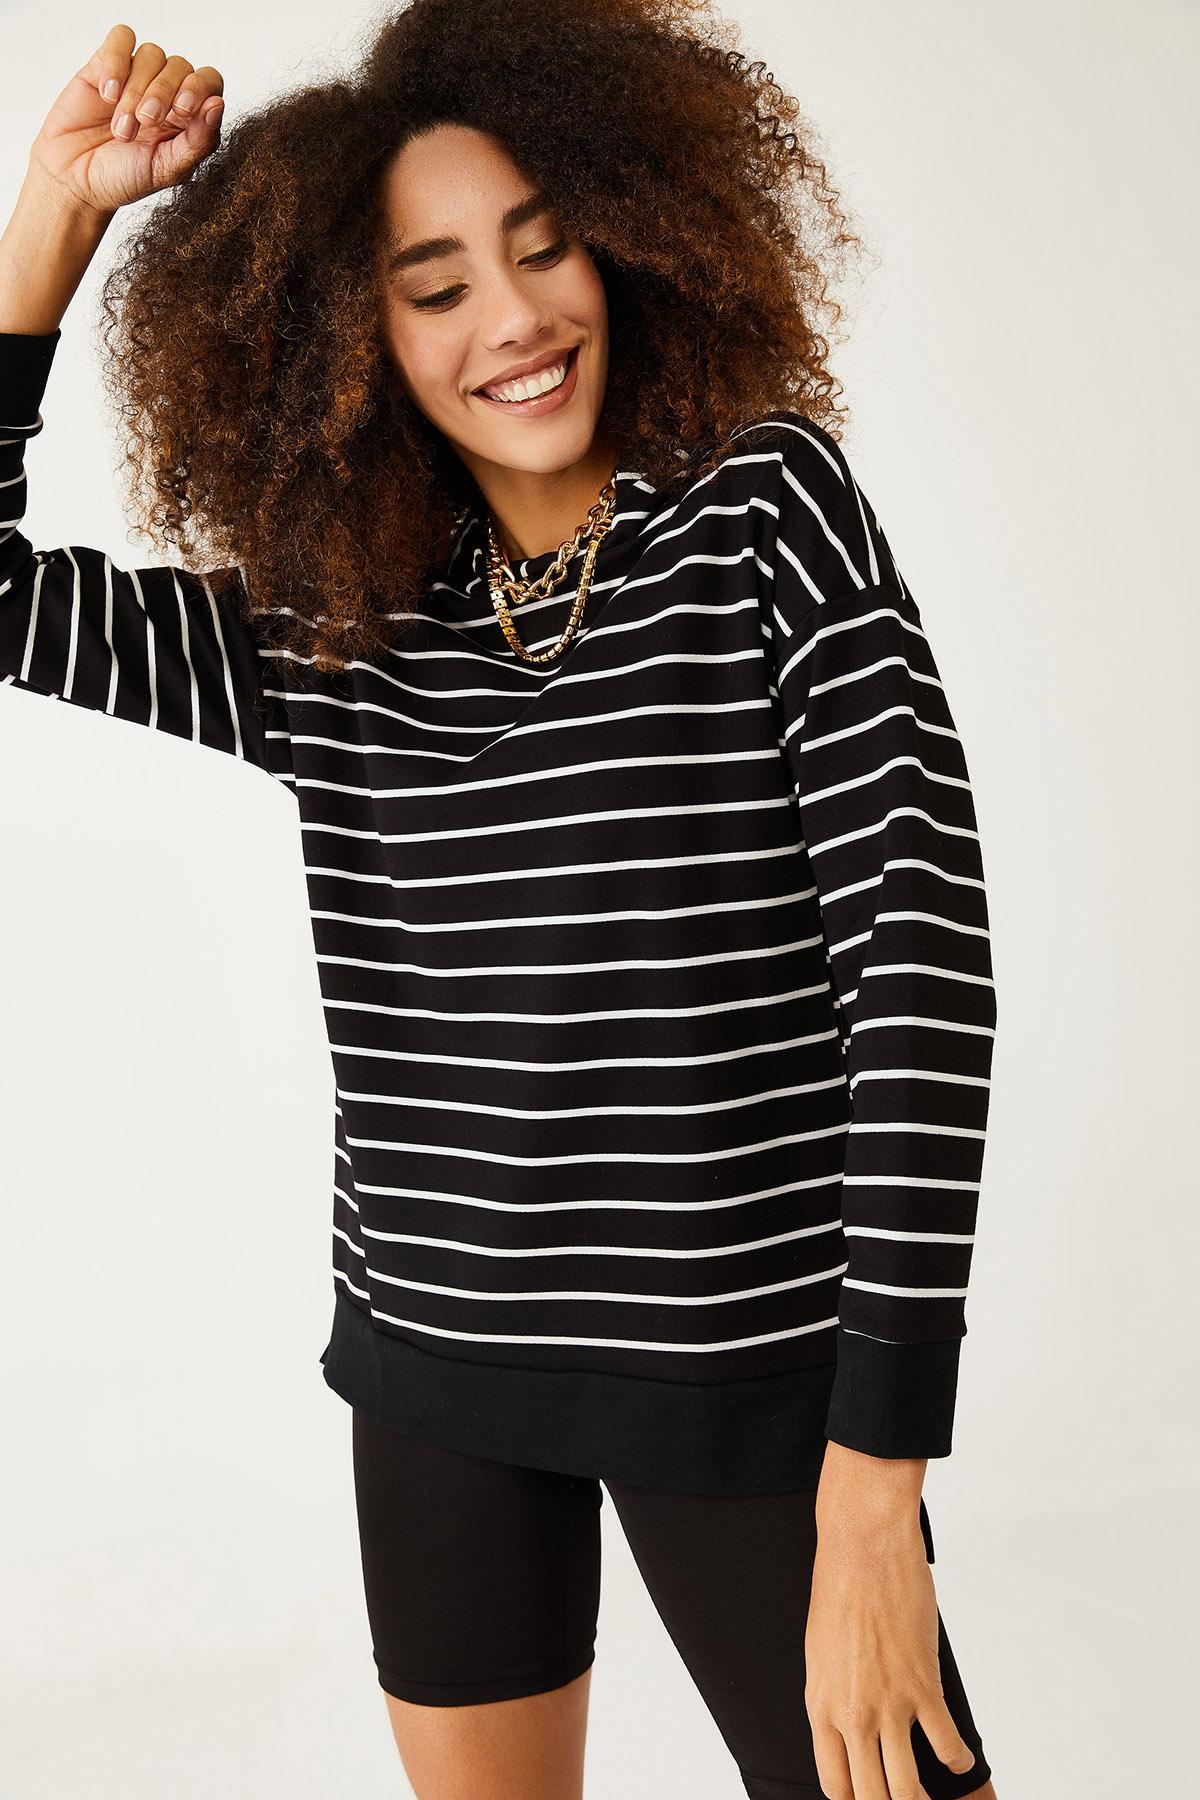 XHAN - Siyah & Beyaz Çizgili Sweatshirt 1KXK8-44429-02